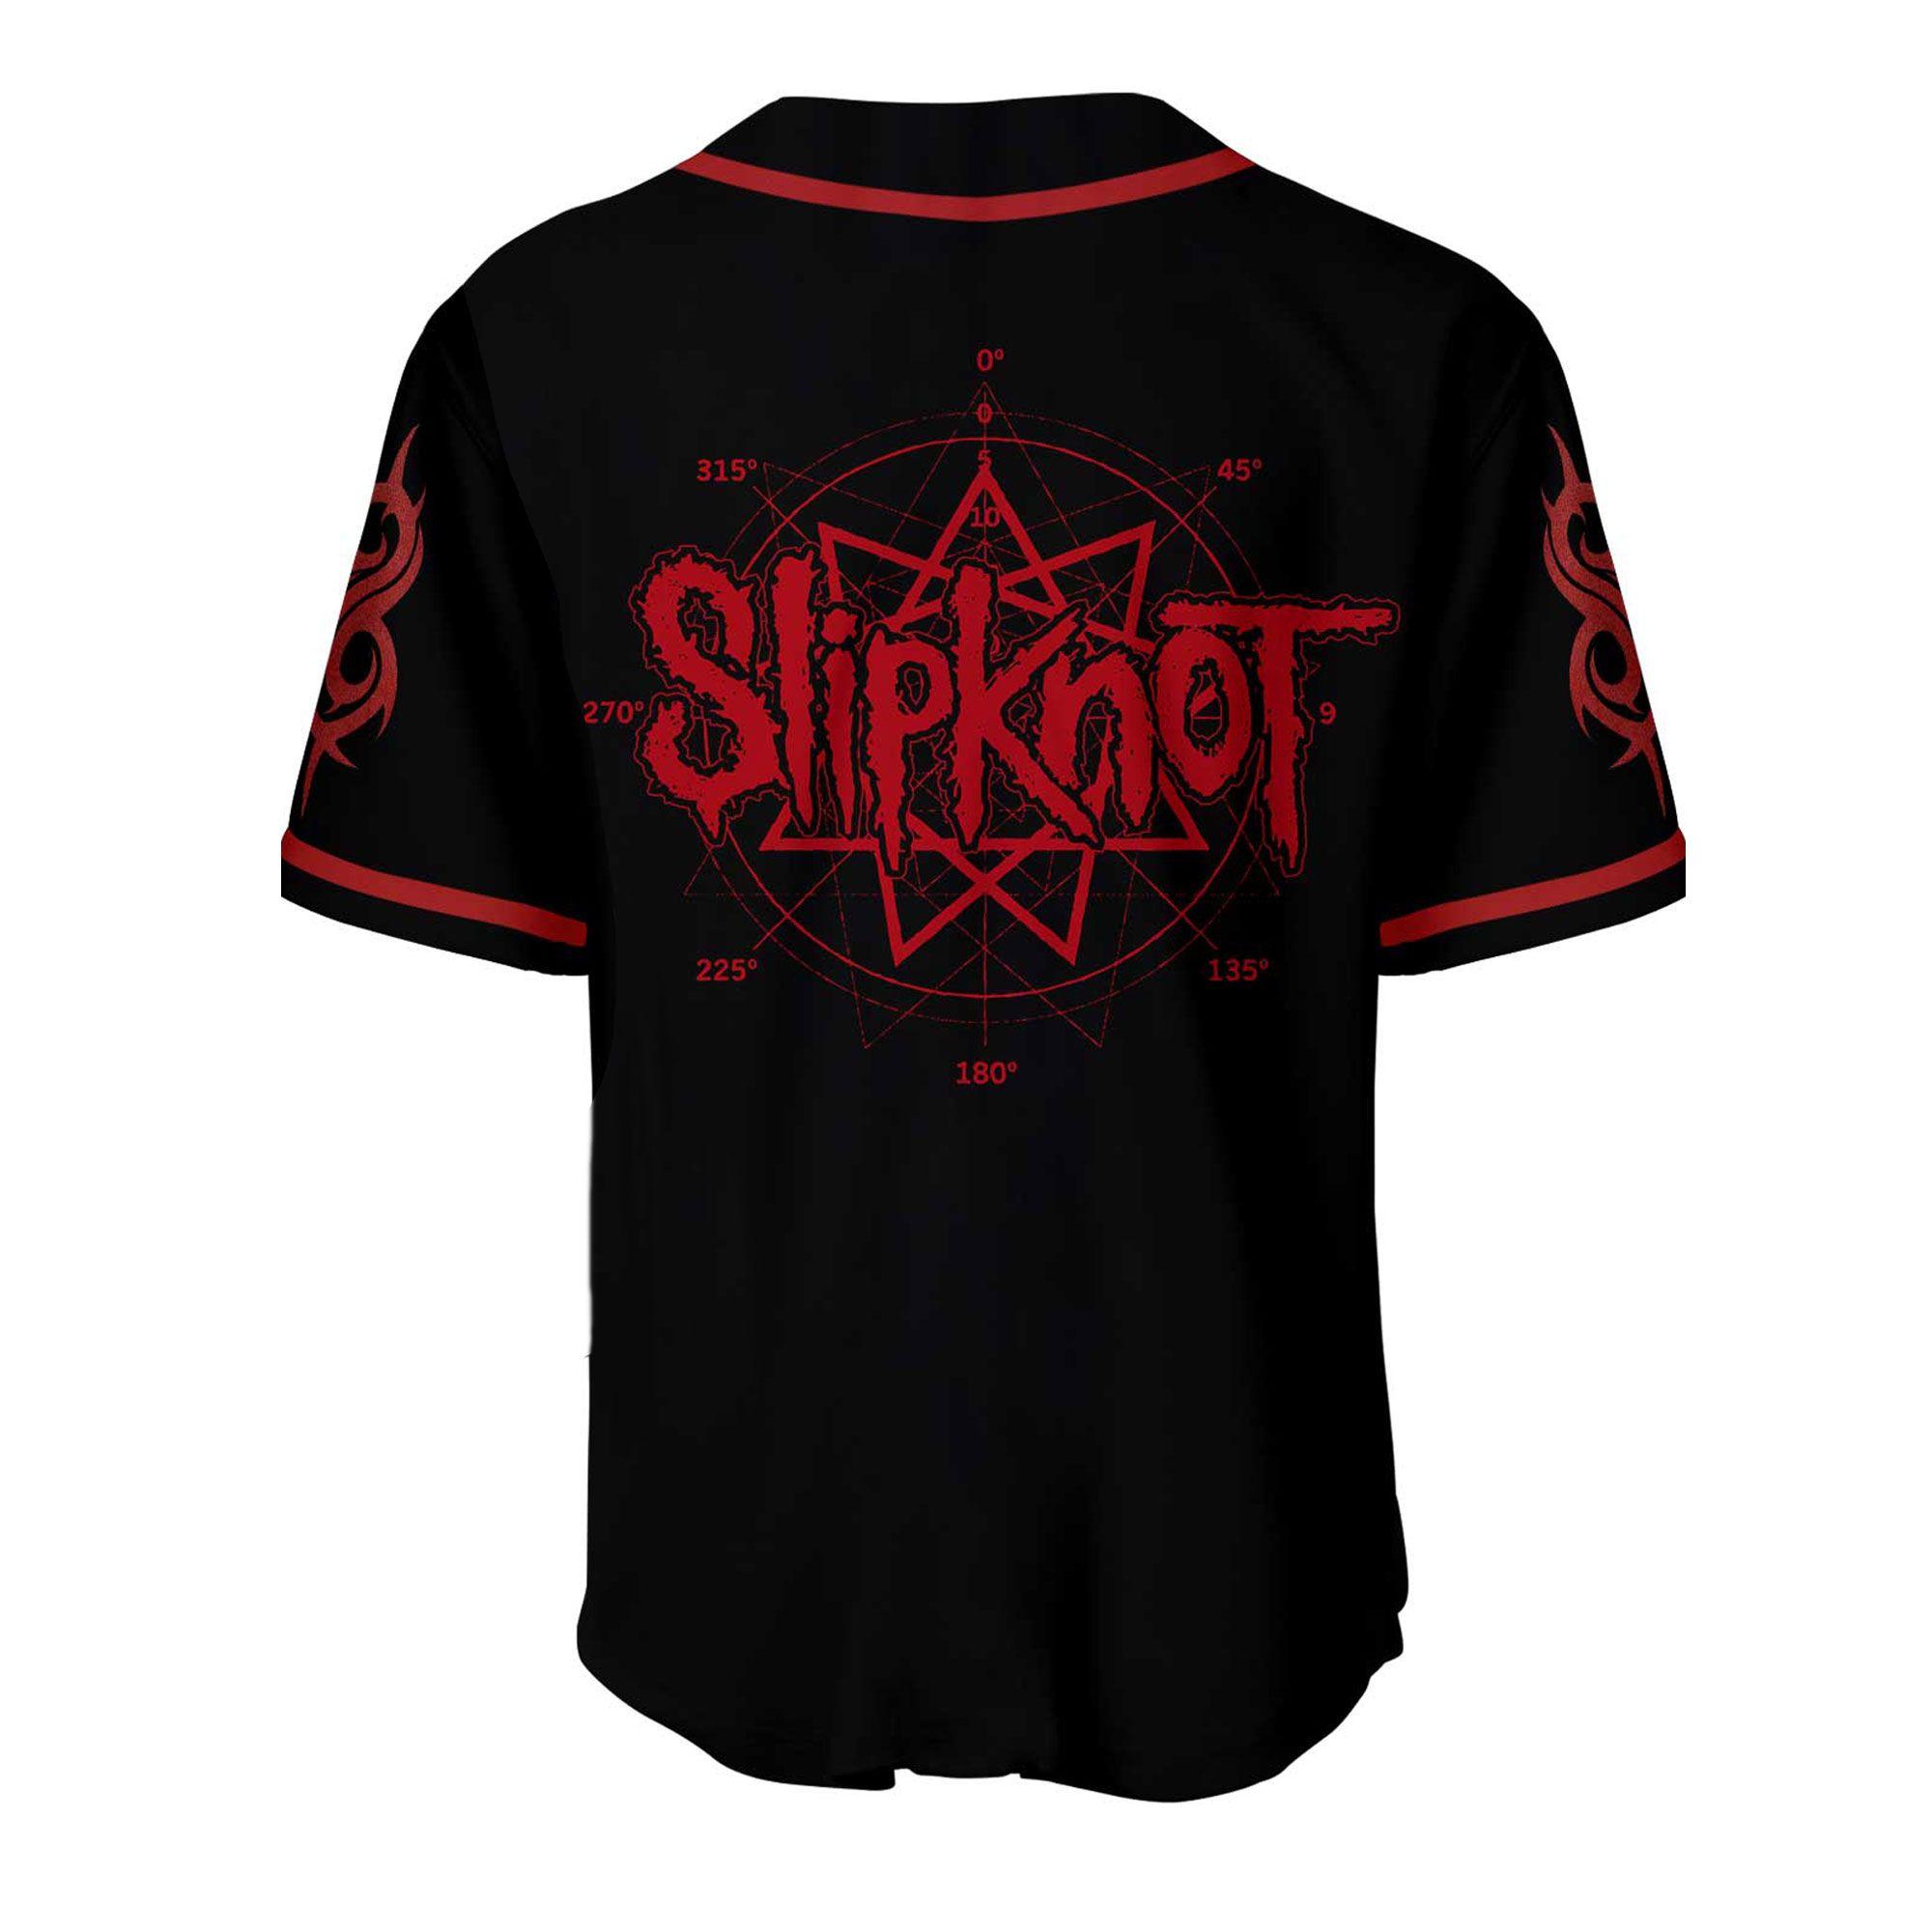 Slipknot Baseball Jersey Shirt